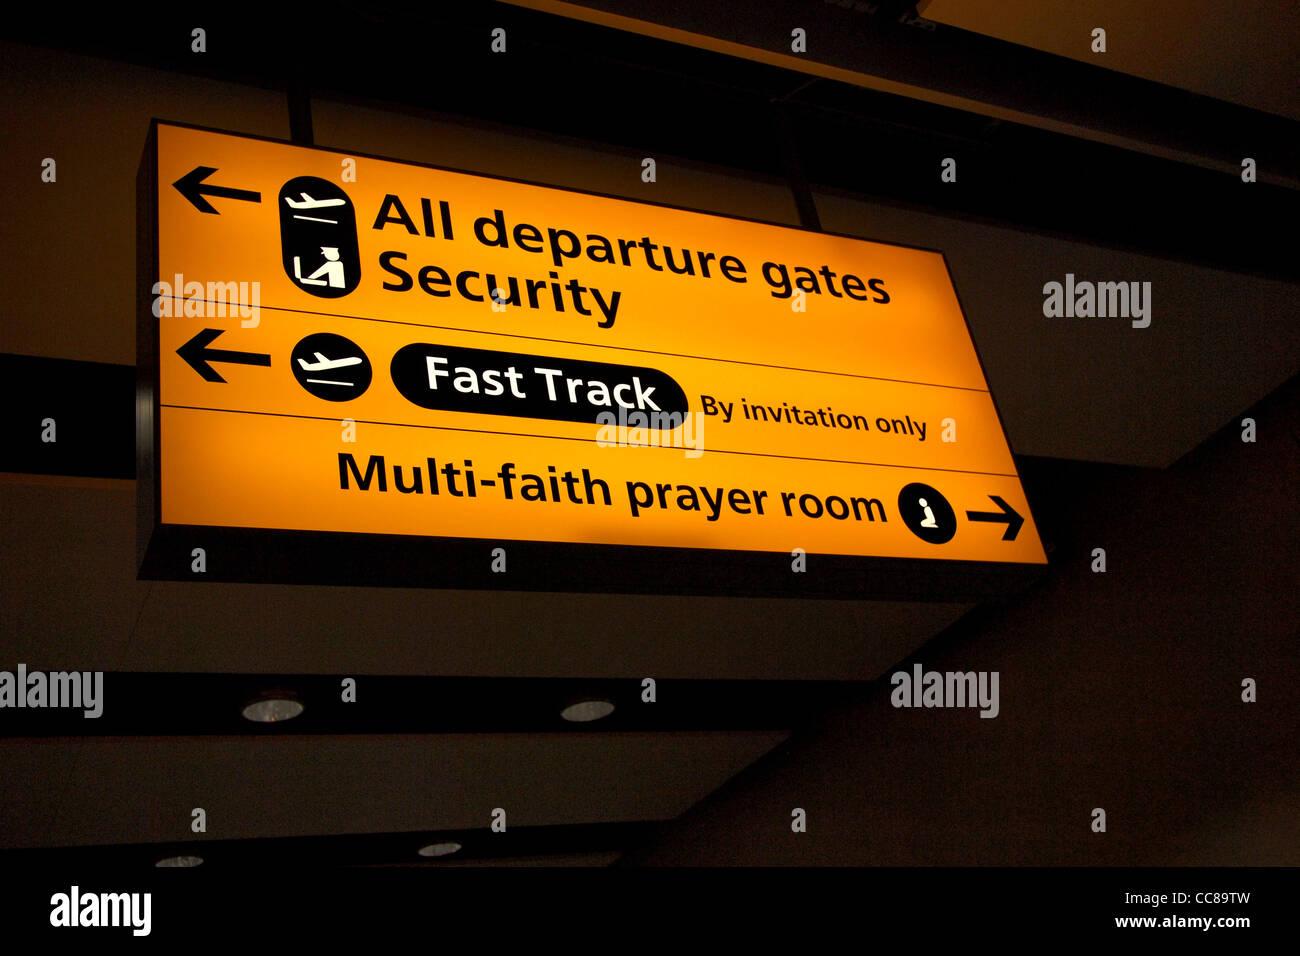 uk airport multi-faith prayer room sign - Stock Image